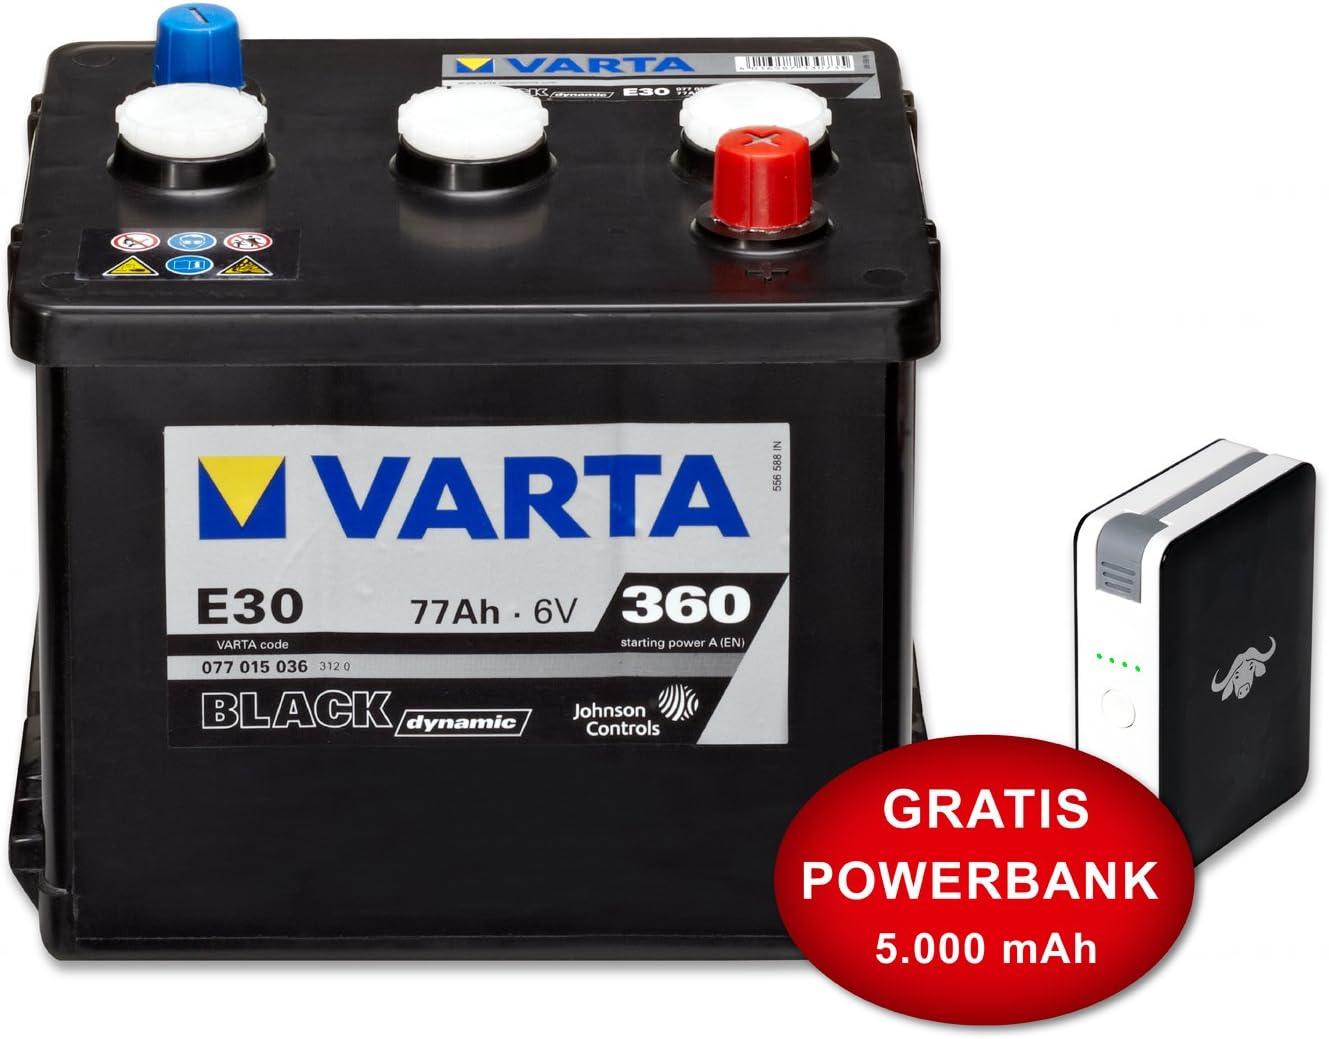 : Varta Black Dynamic e30 W – 6 V77 Ah – 360 Aen